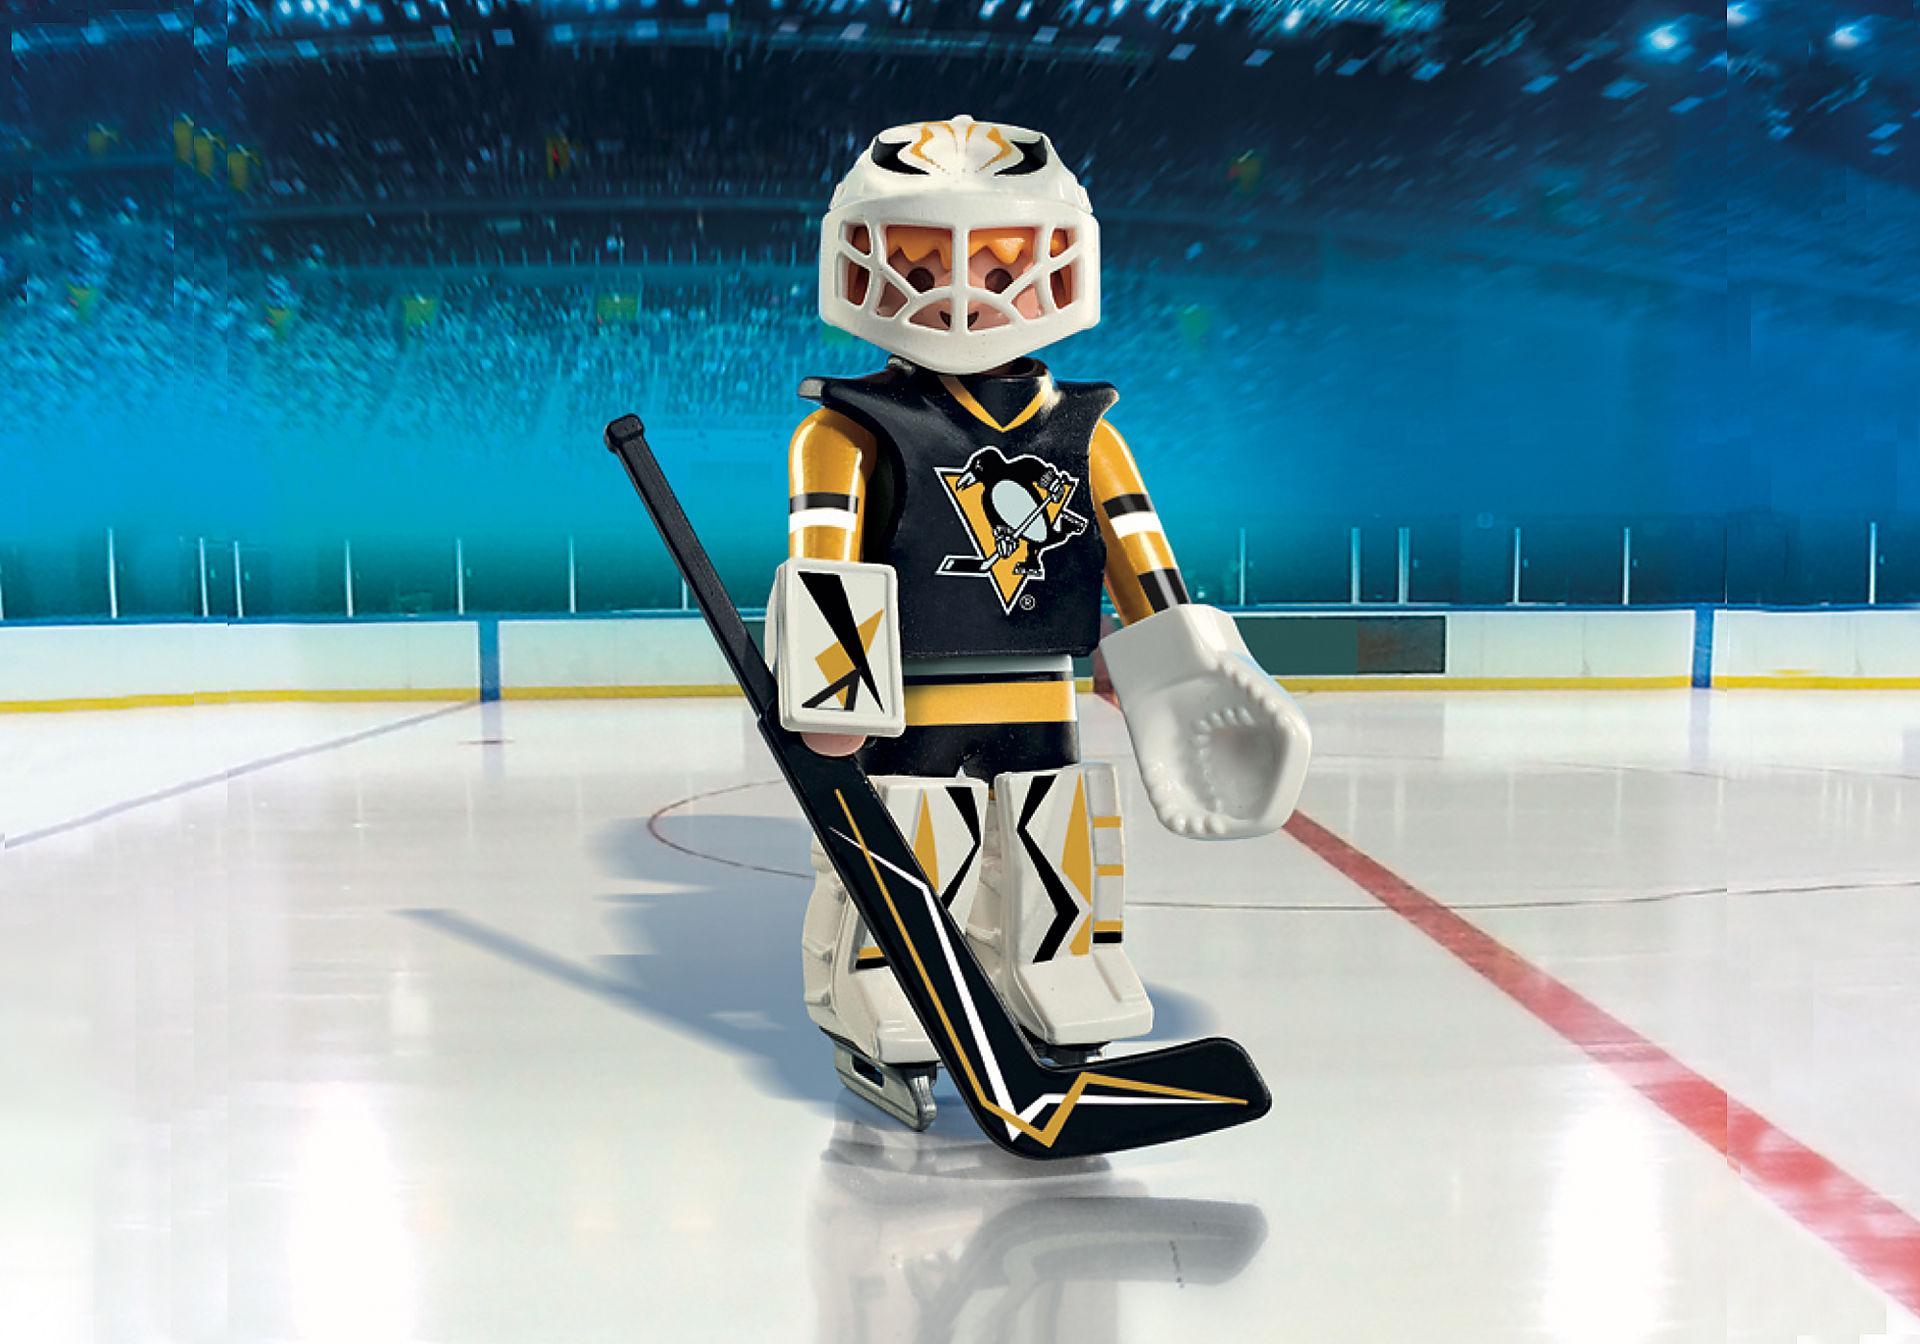 9028 NHL® Pittsburgh Penguins® Goalie zoom image1